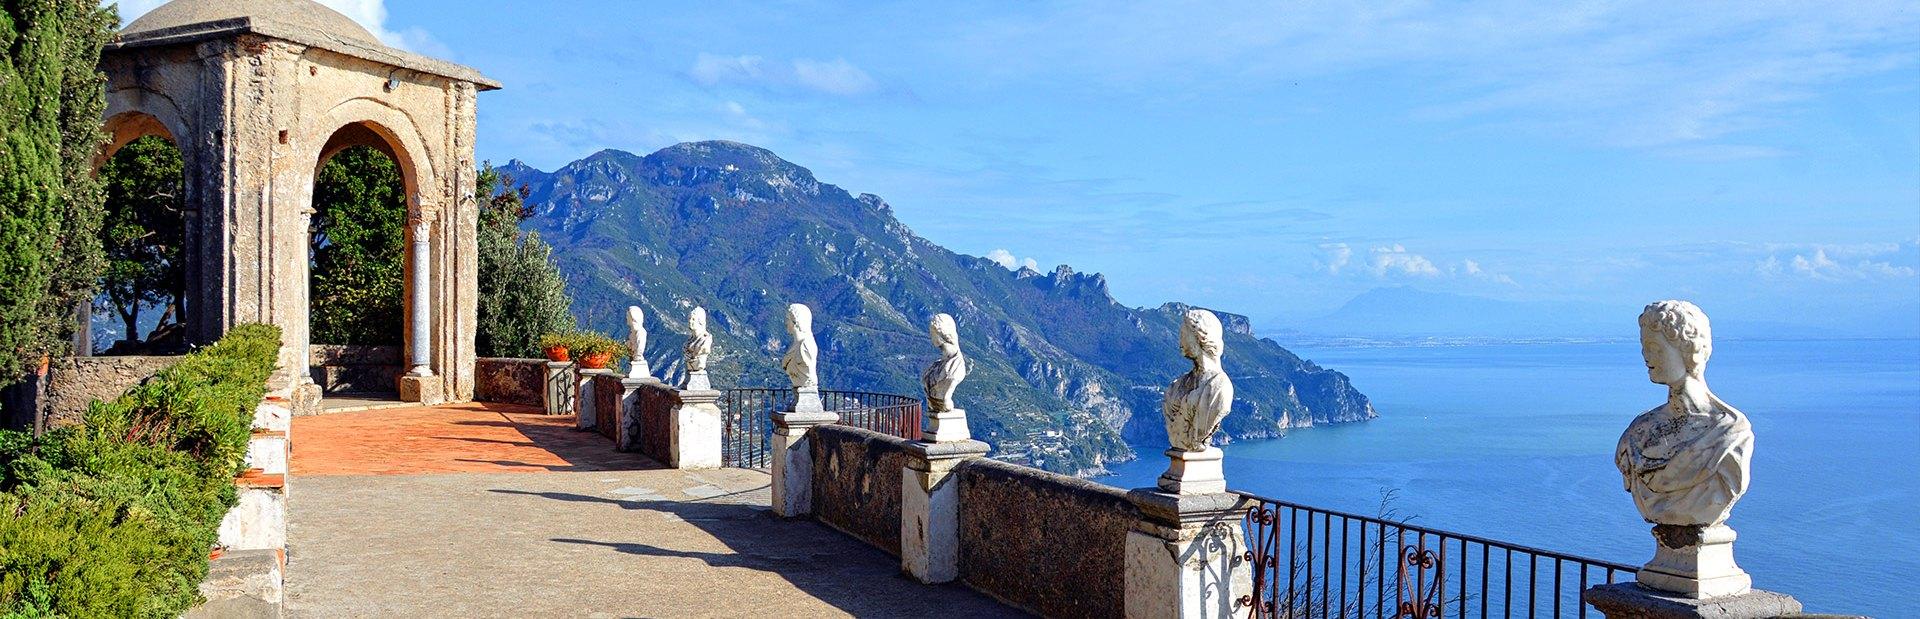 5 reasons to visit Ravello on your Amalfi Coast yacht charter